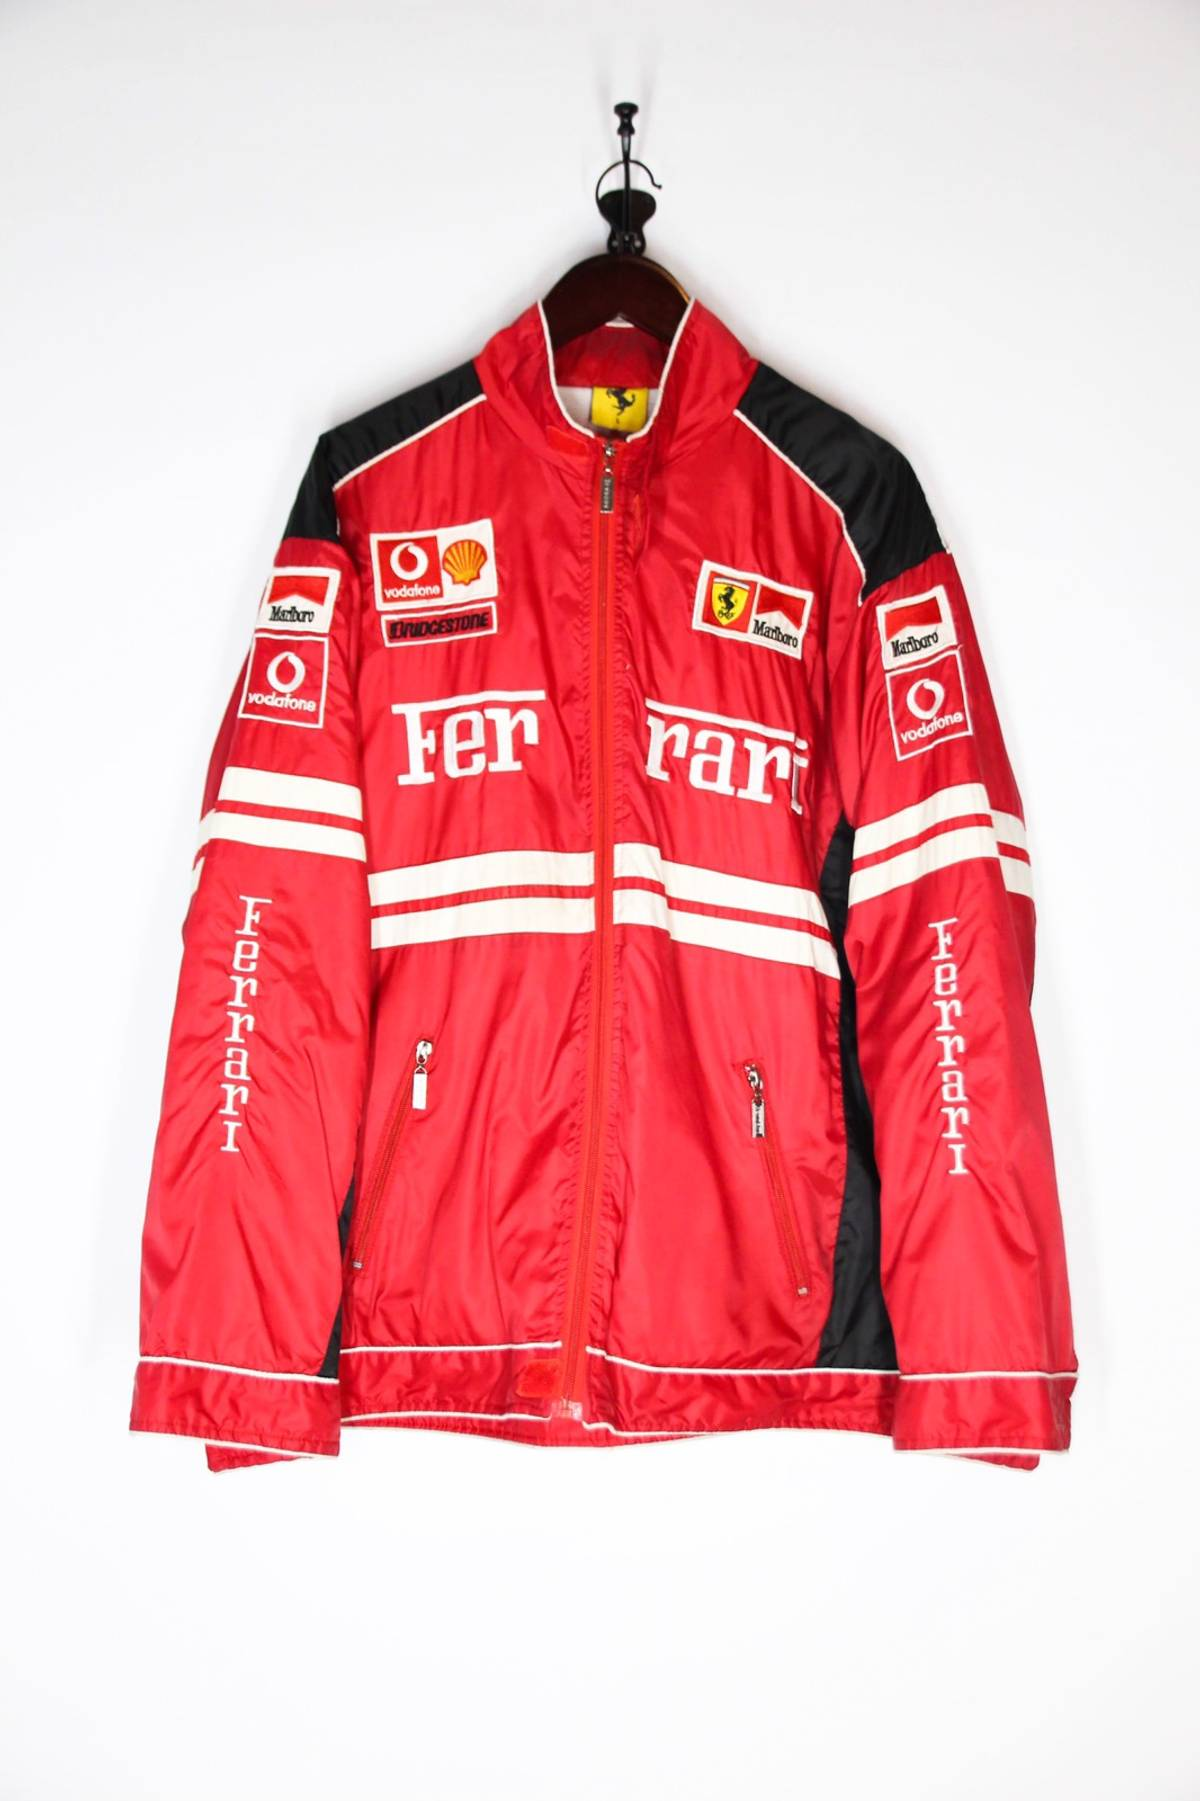 Marlboro Vintage Ferrari F1 Racing Jacket Michael Schumacher Marlboro Grailed